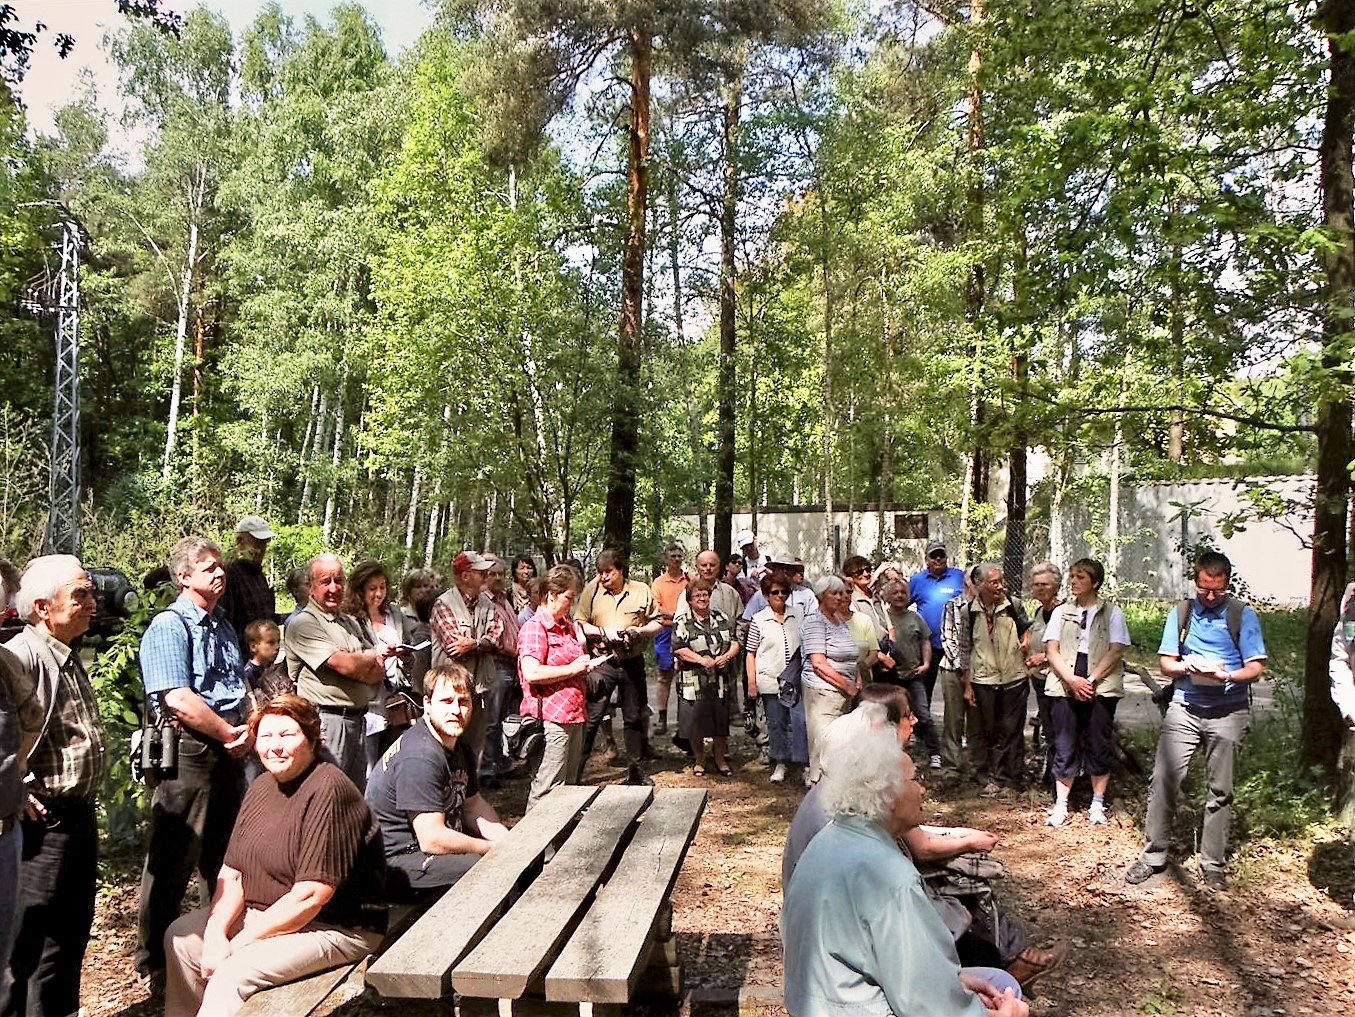 Eröffnung des Wanderweges Natur-Energie- Erlebnis